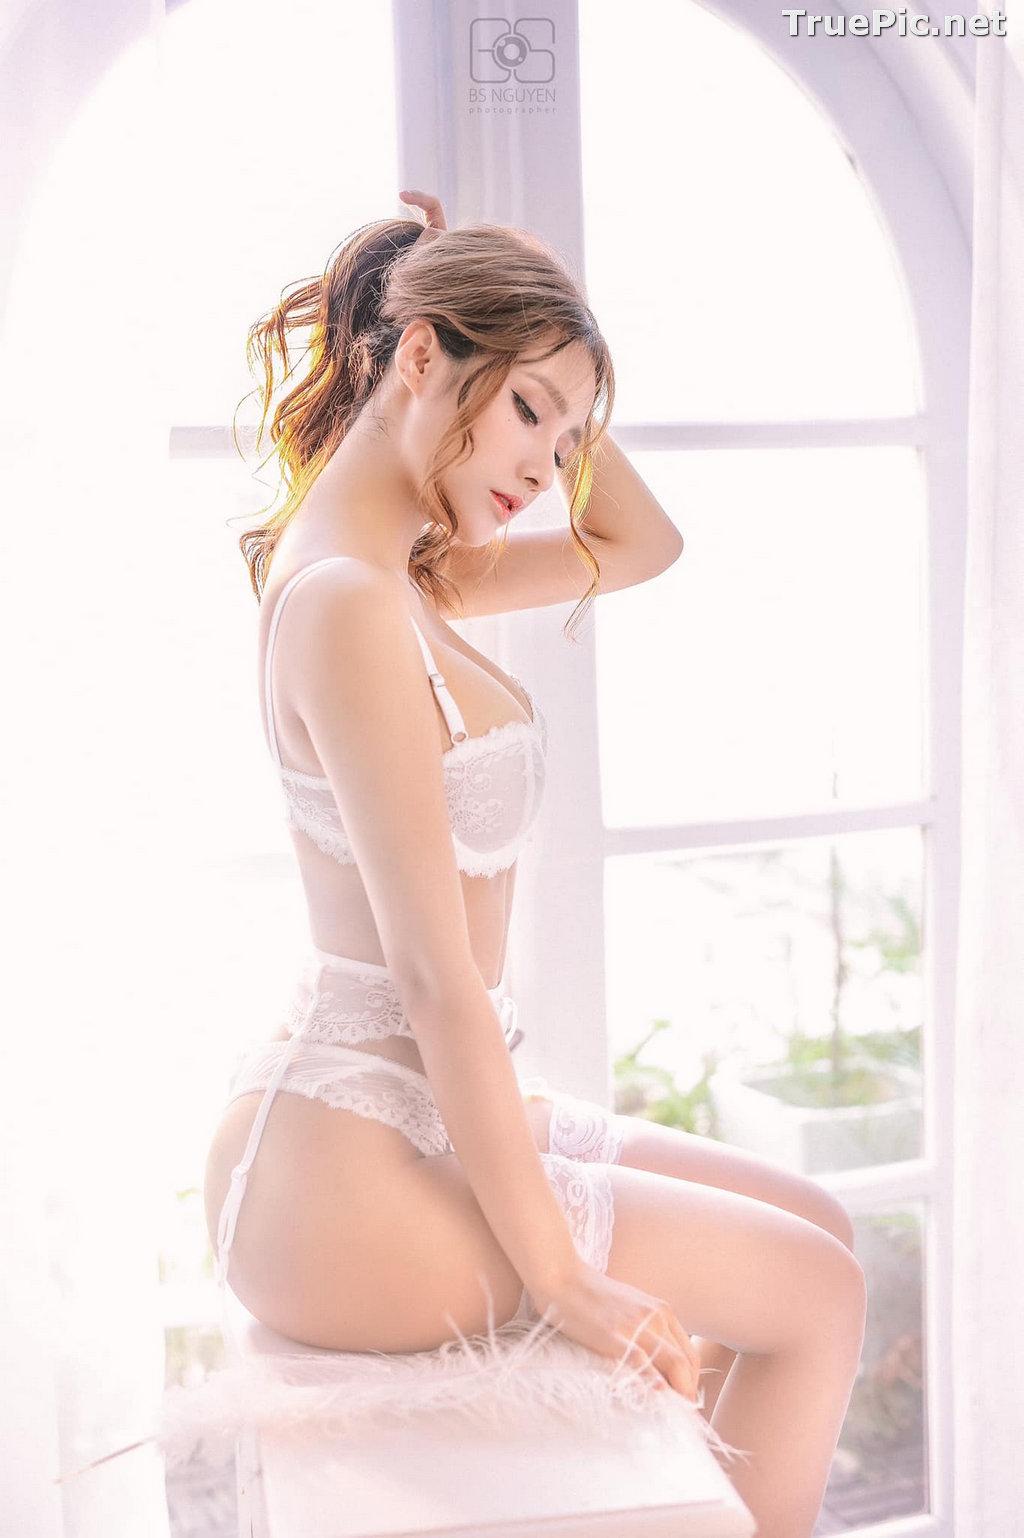 Image Vietnamese Model - Nguyen Thi Phi Yen - Beautiful Sexy White Lingerie - TruePic.net - Picture-13